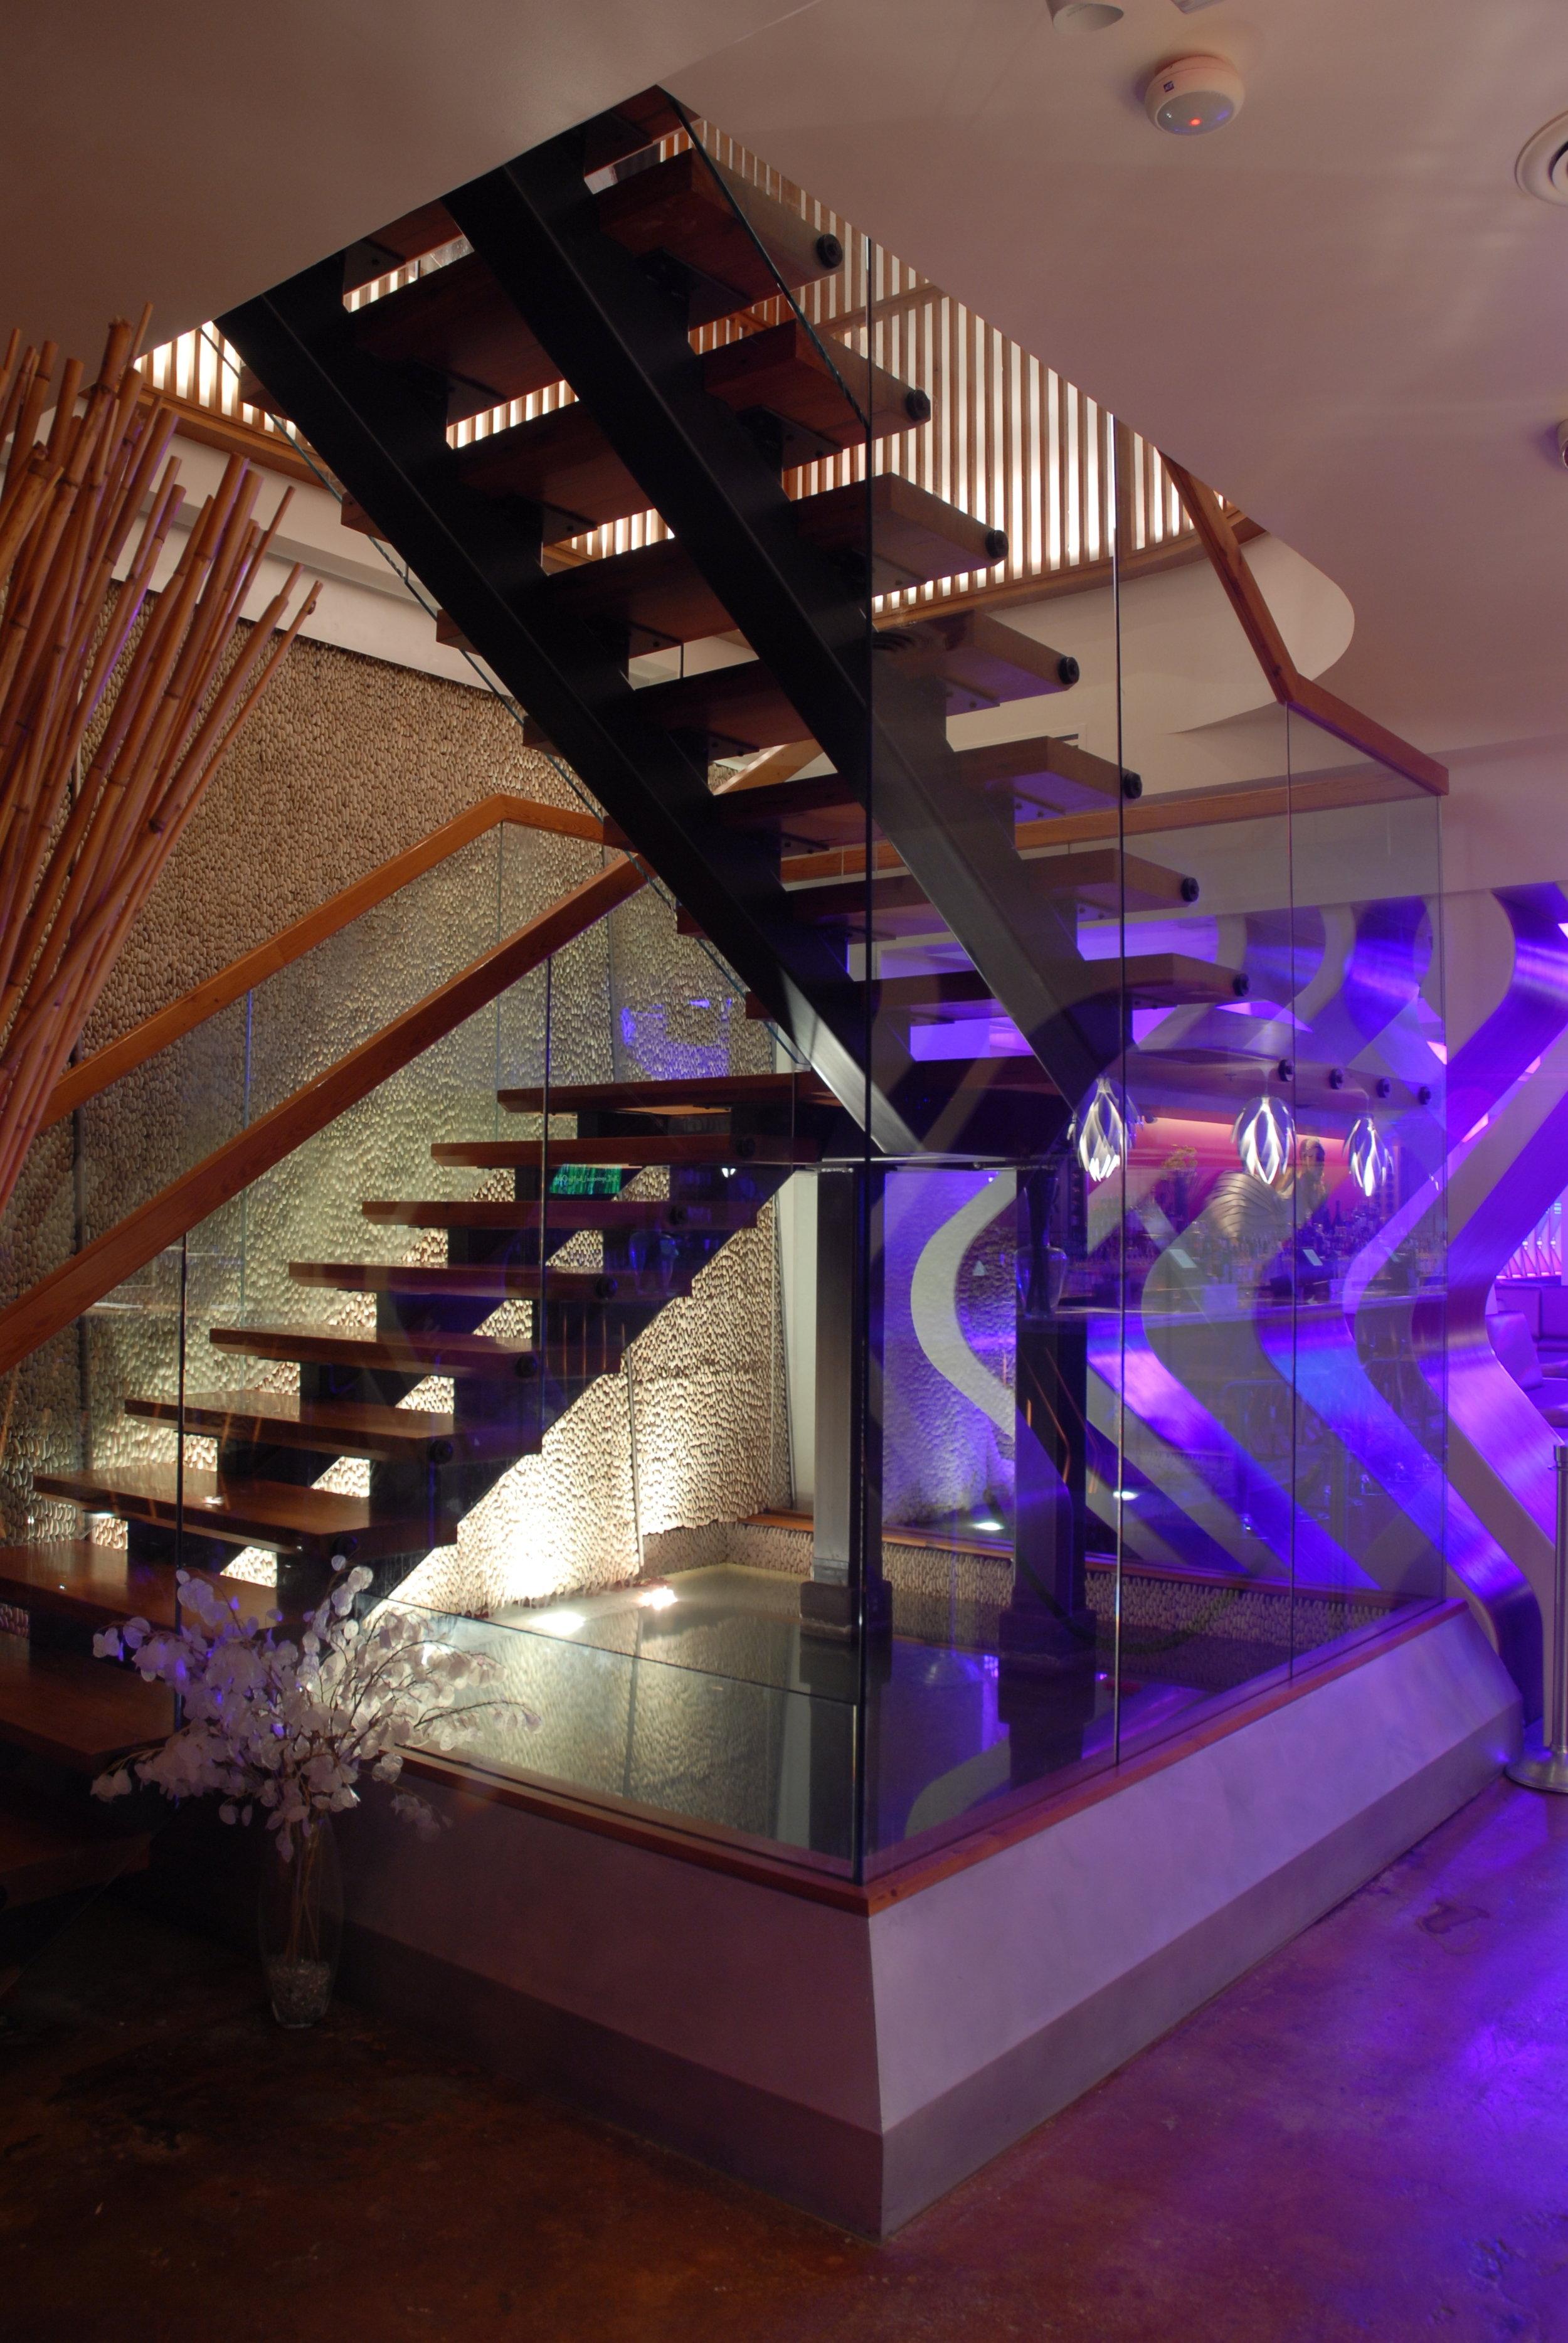 studio-saint-bars-and-restaurants-lotus-lounge-washington-dc-2